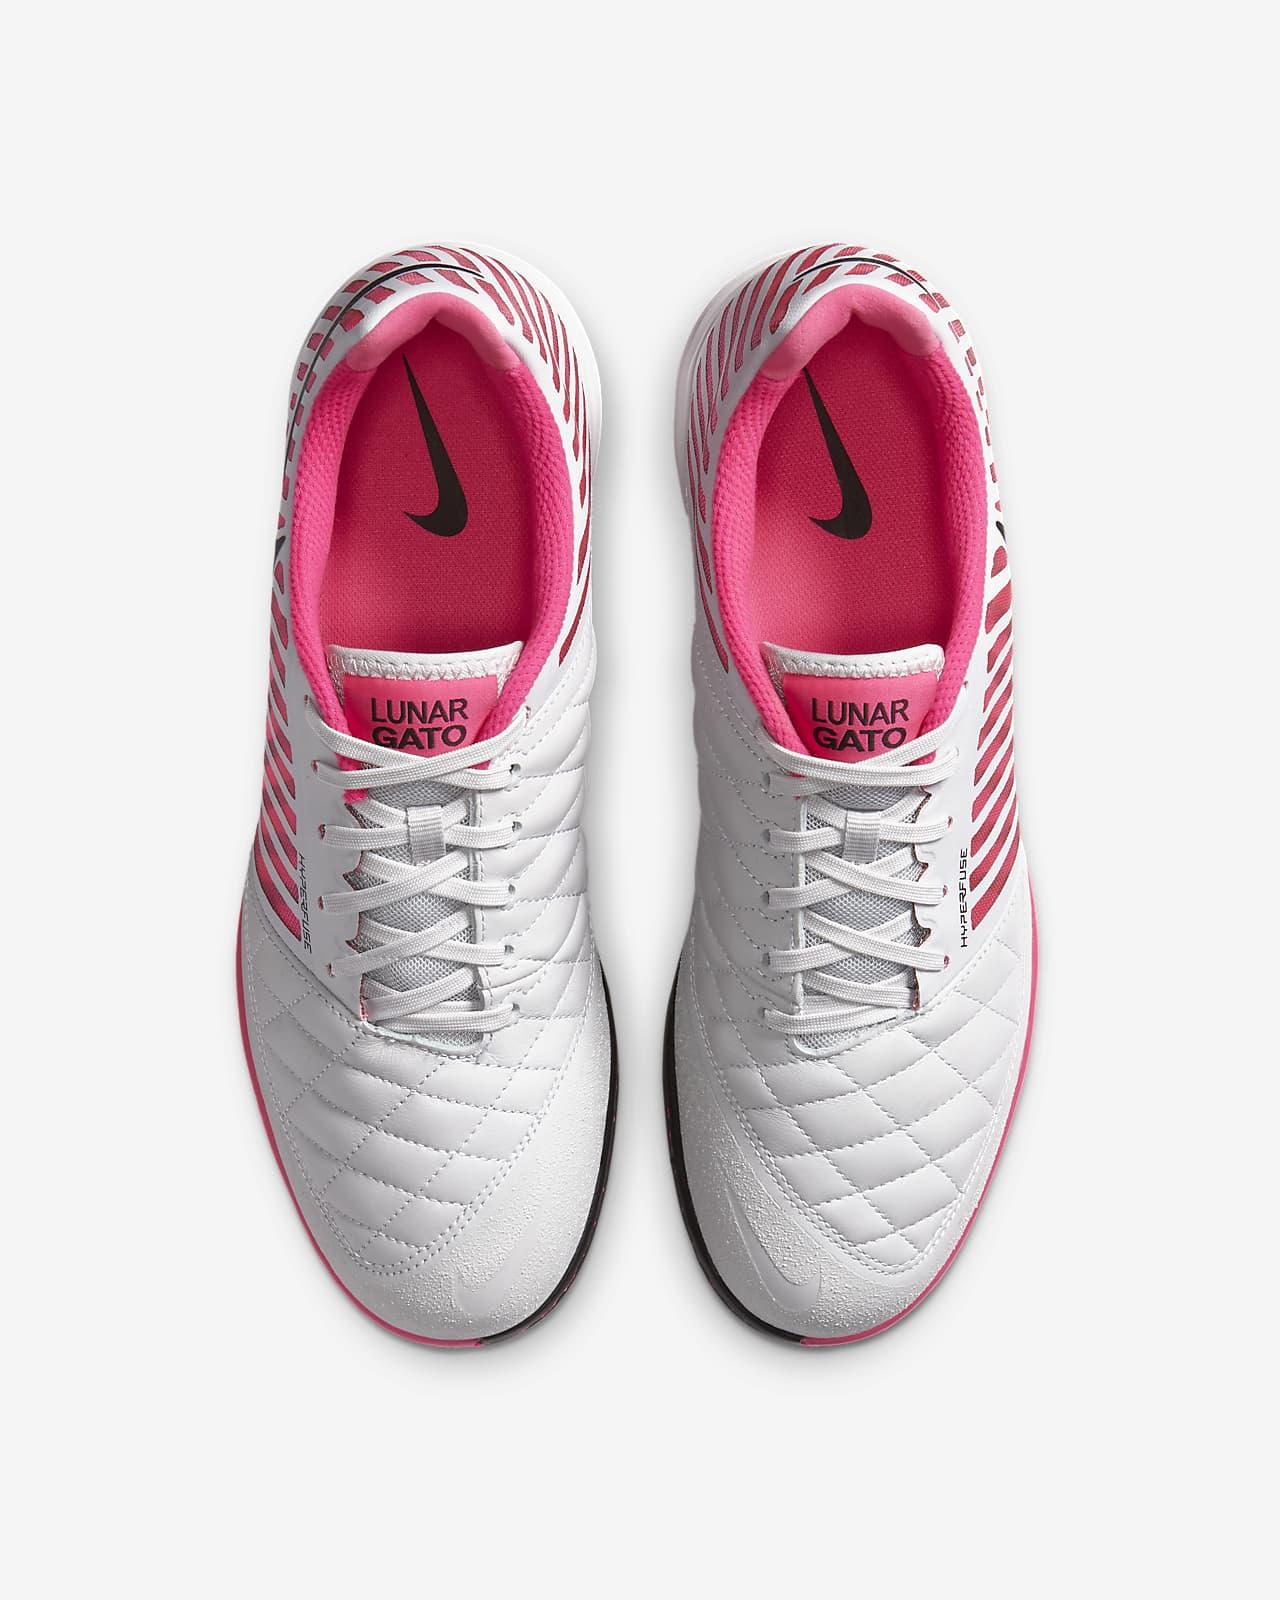 Scarpa da calcio per campo indoorcemento Nike Lunar Gato II